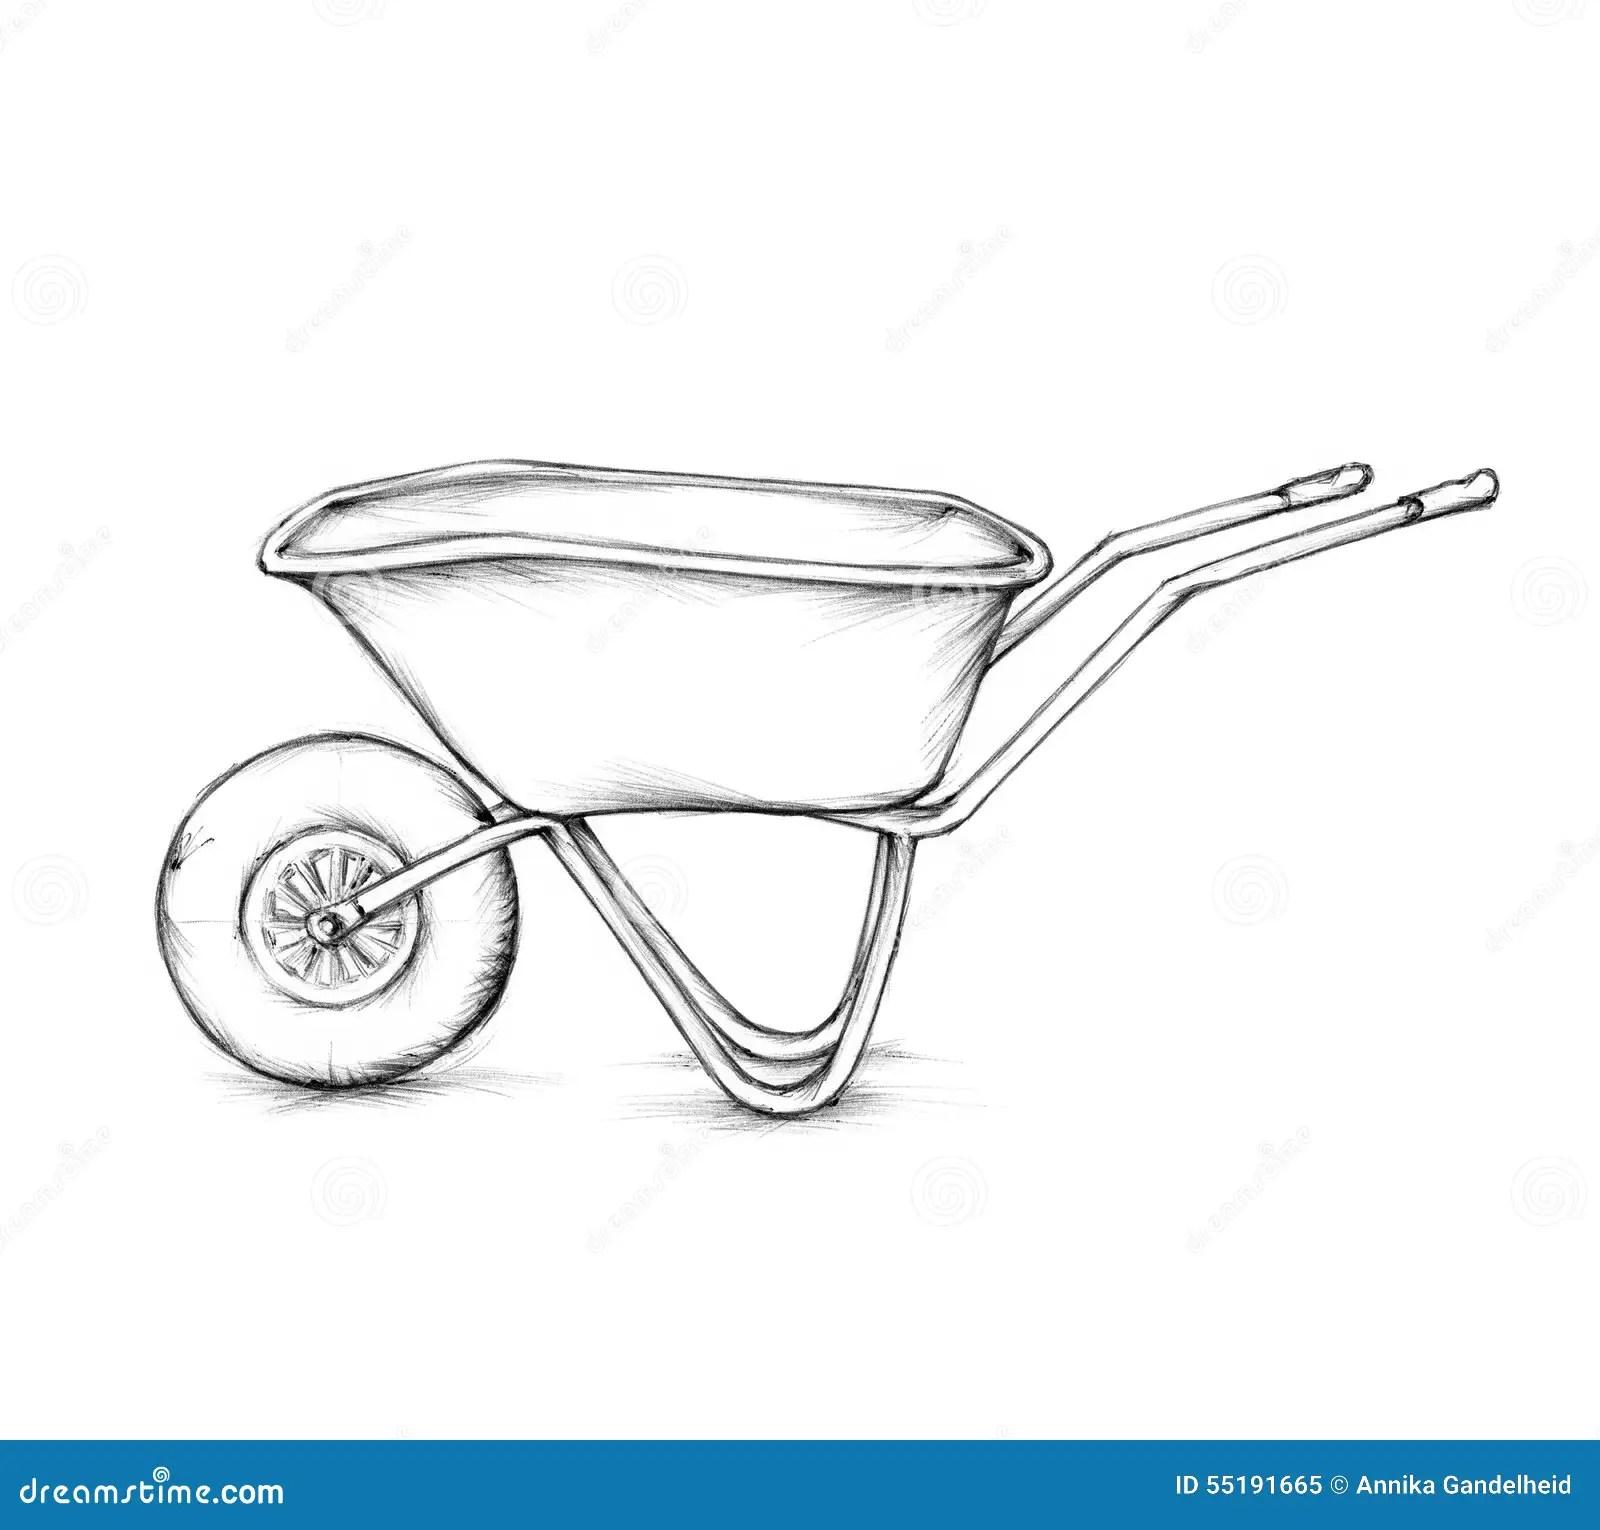 images How To Draw A Simple Wheelbarrow dreamstime com